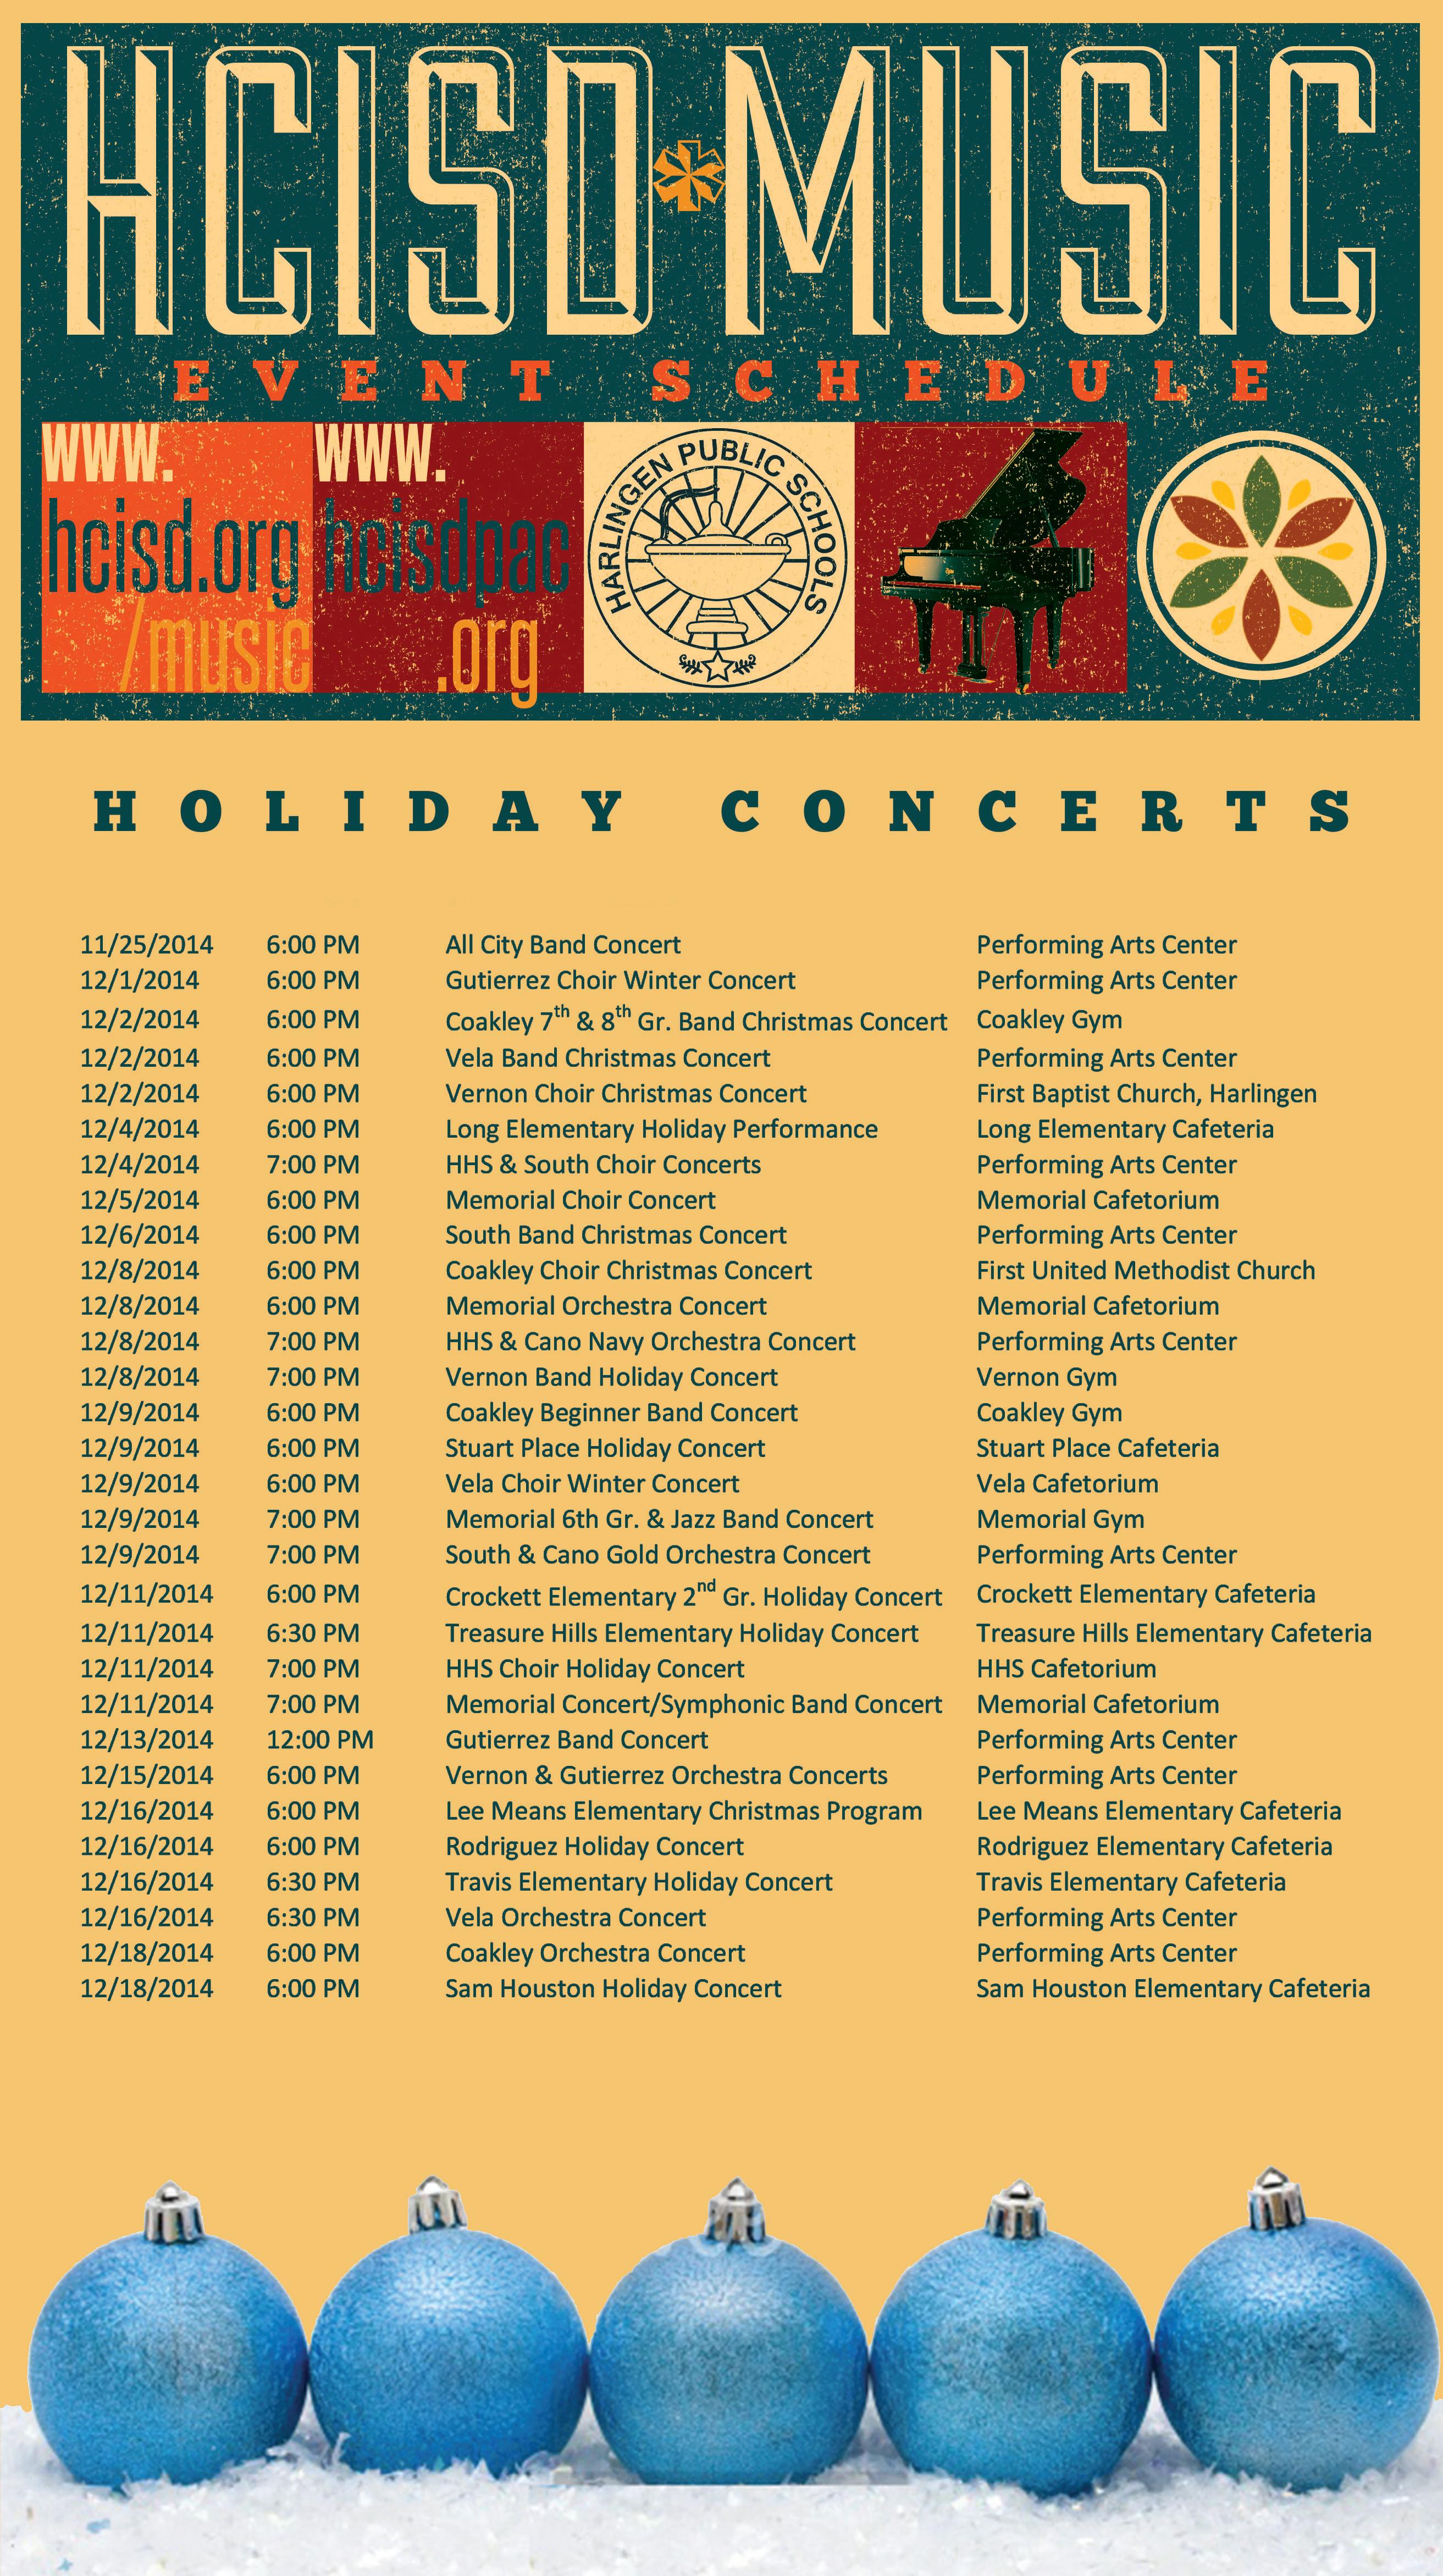 Holiday Concert Schedule 2014